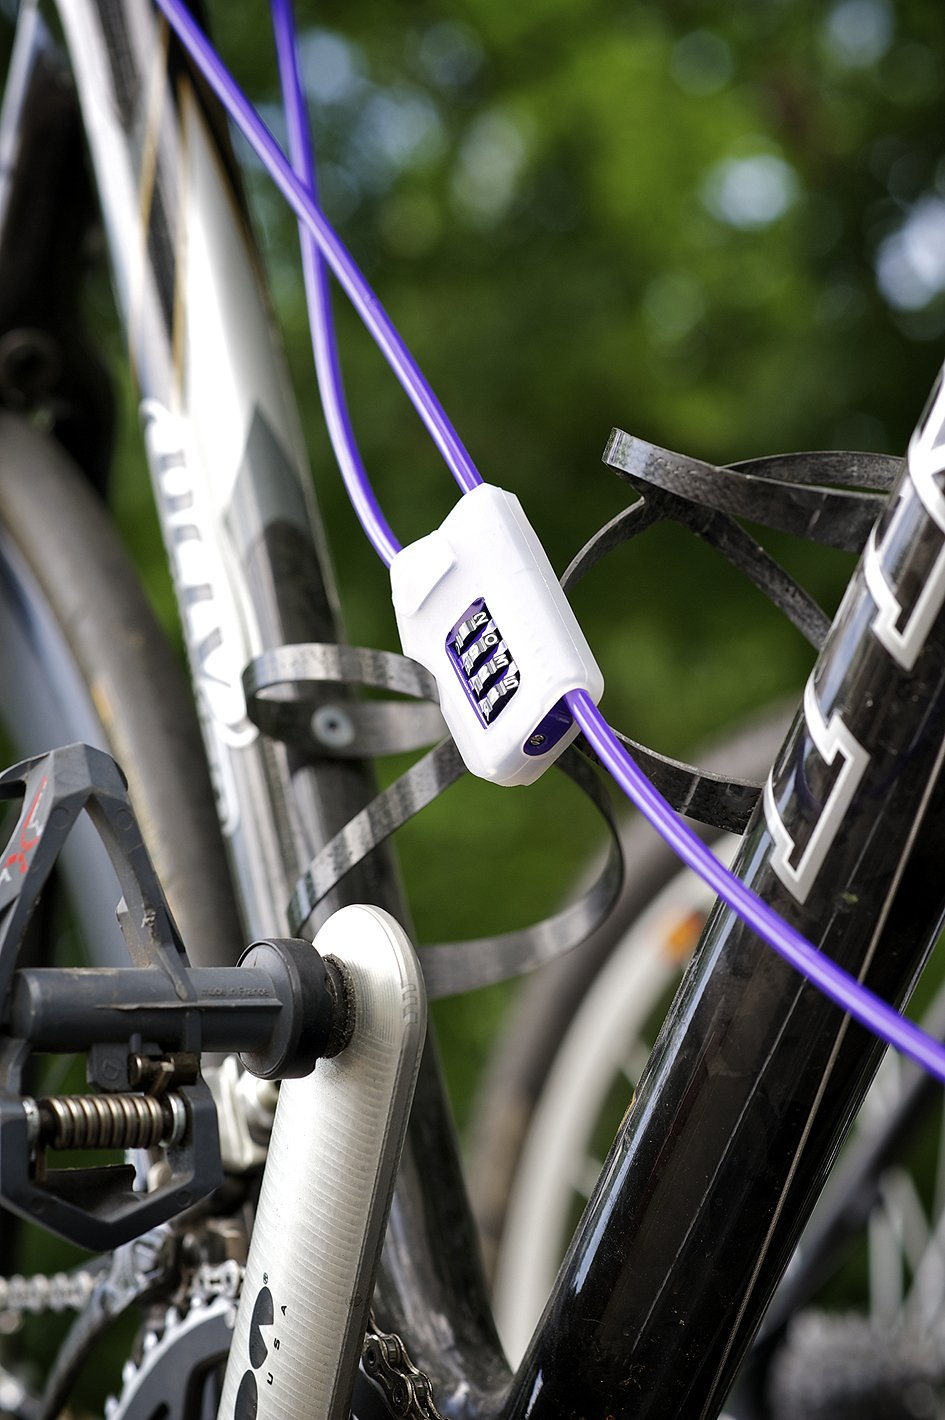 Antifurto Bicicletta 215185 Abus